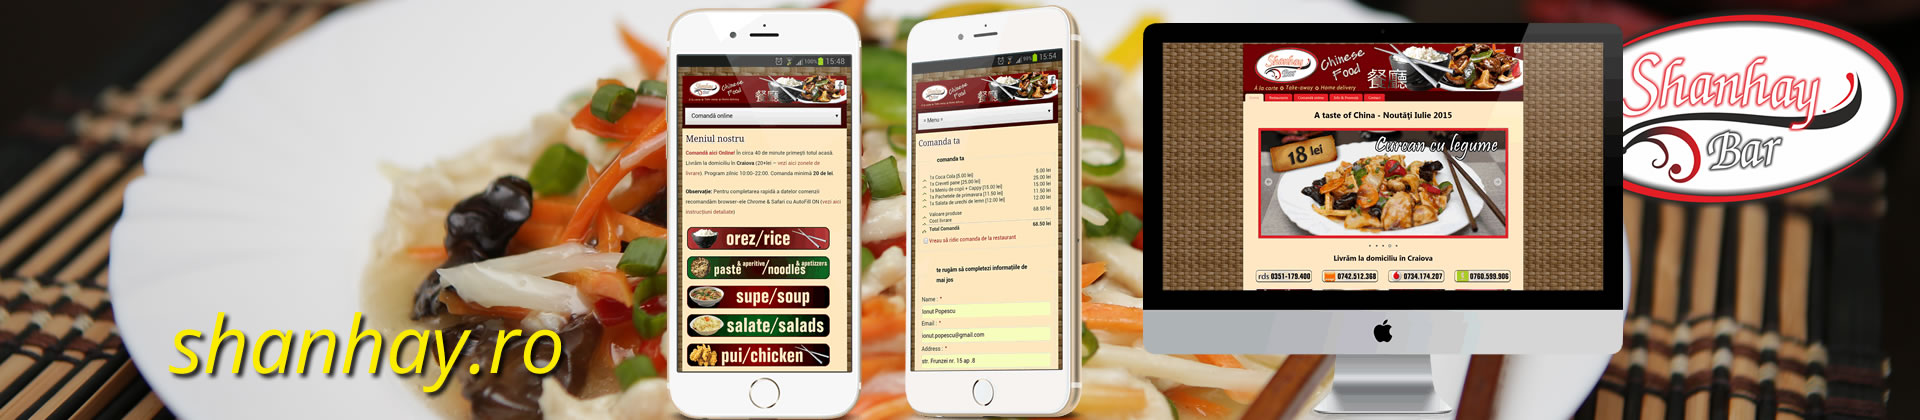 s02-header website responsive restaurant shanhay